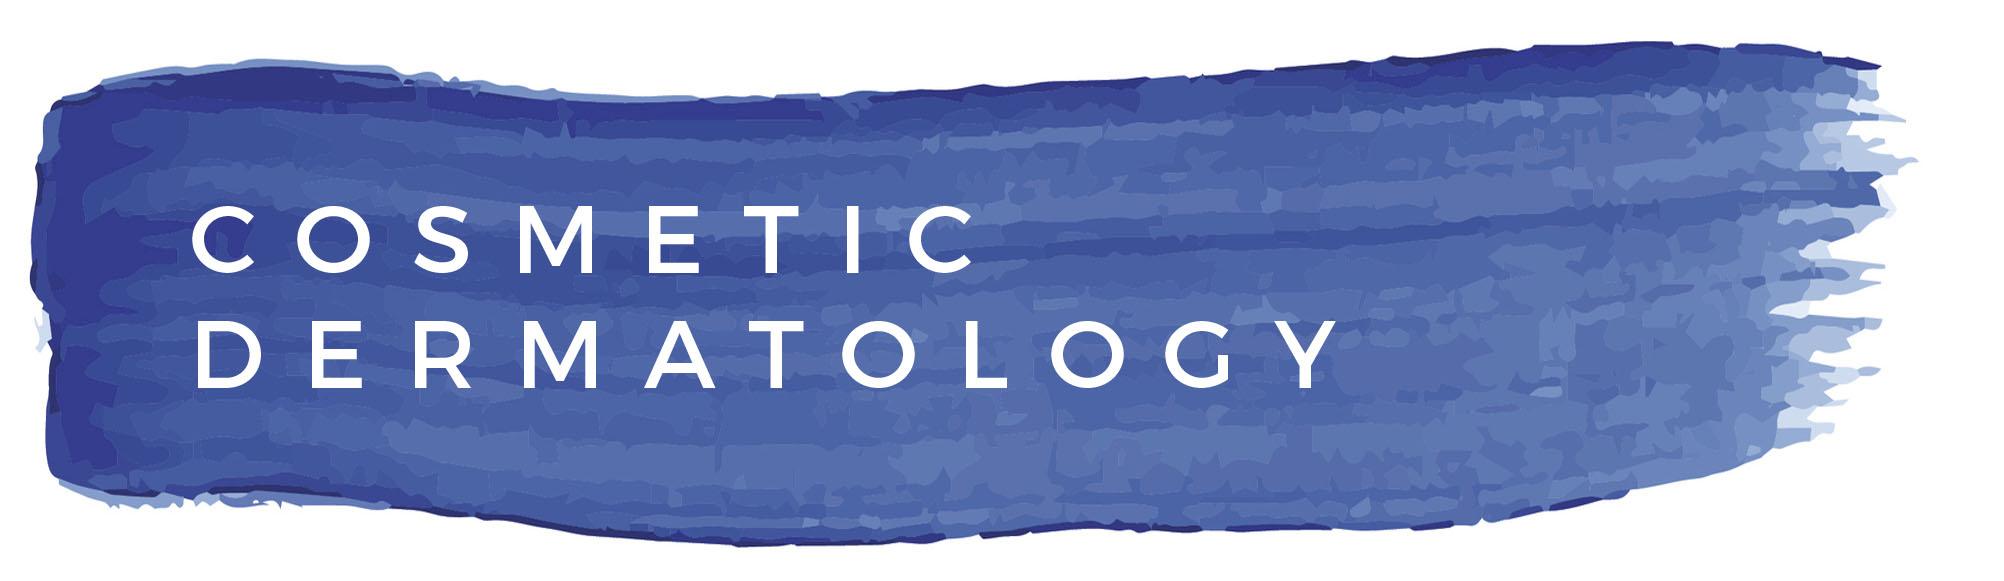 Cosmetic Dermatology.jpg